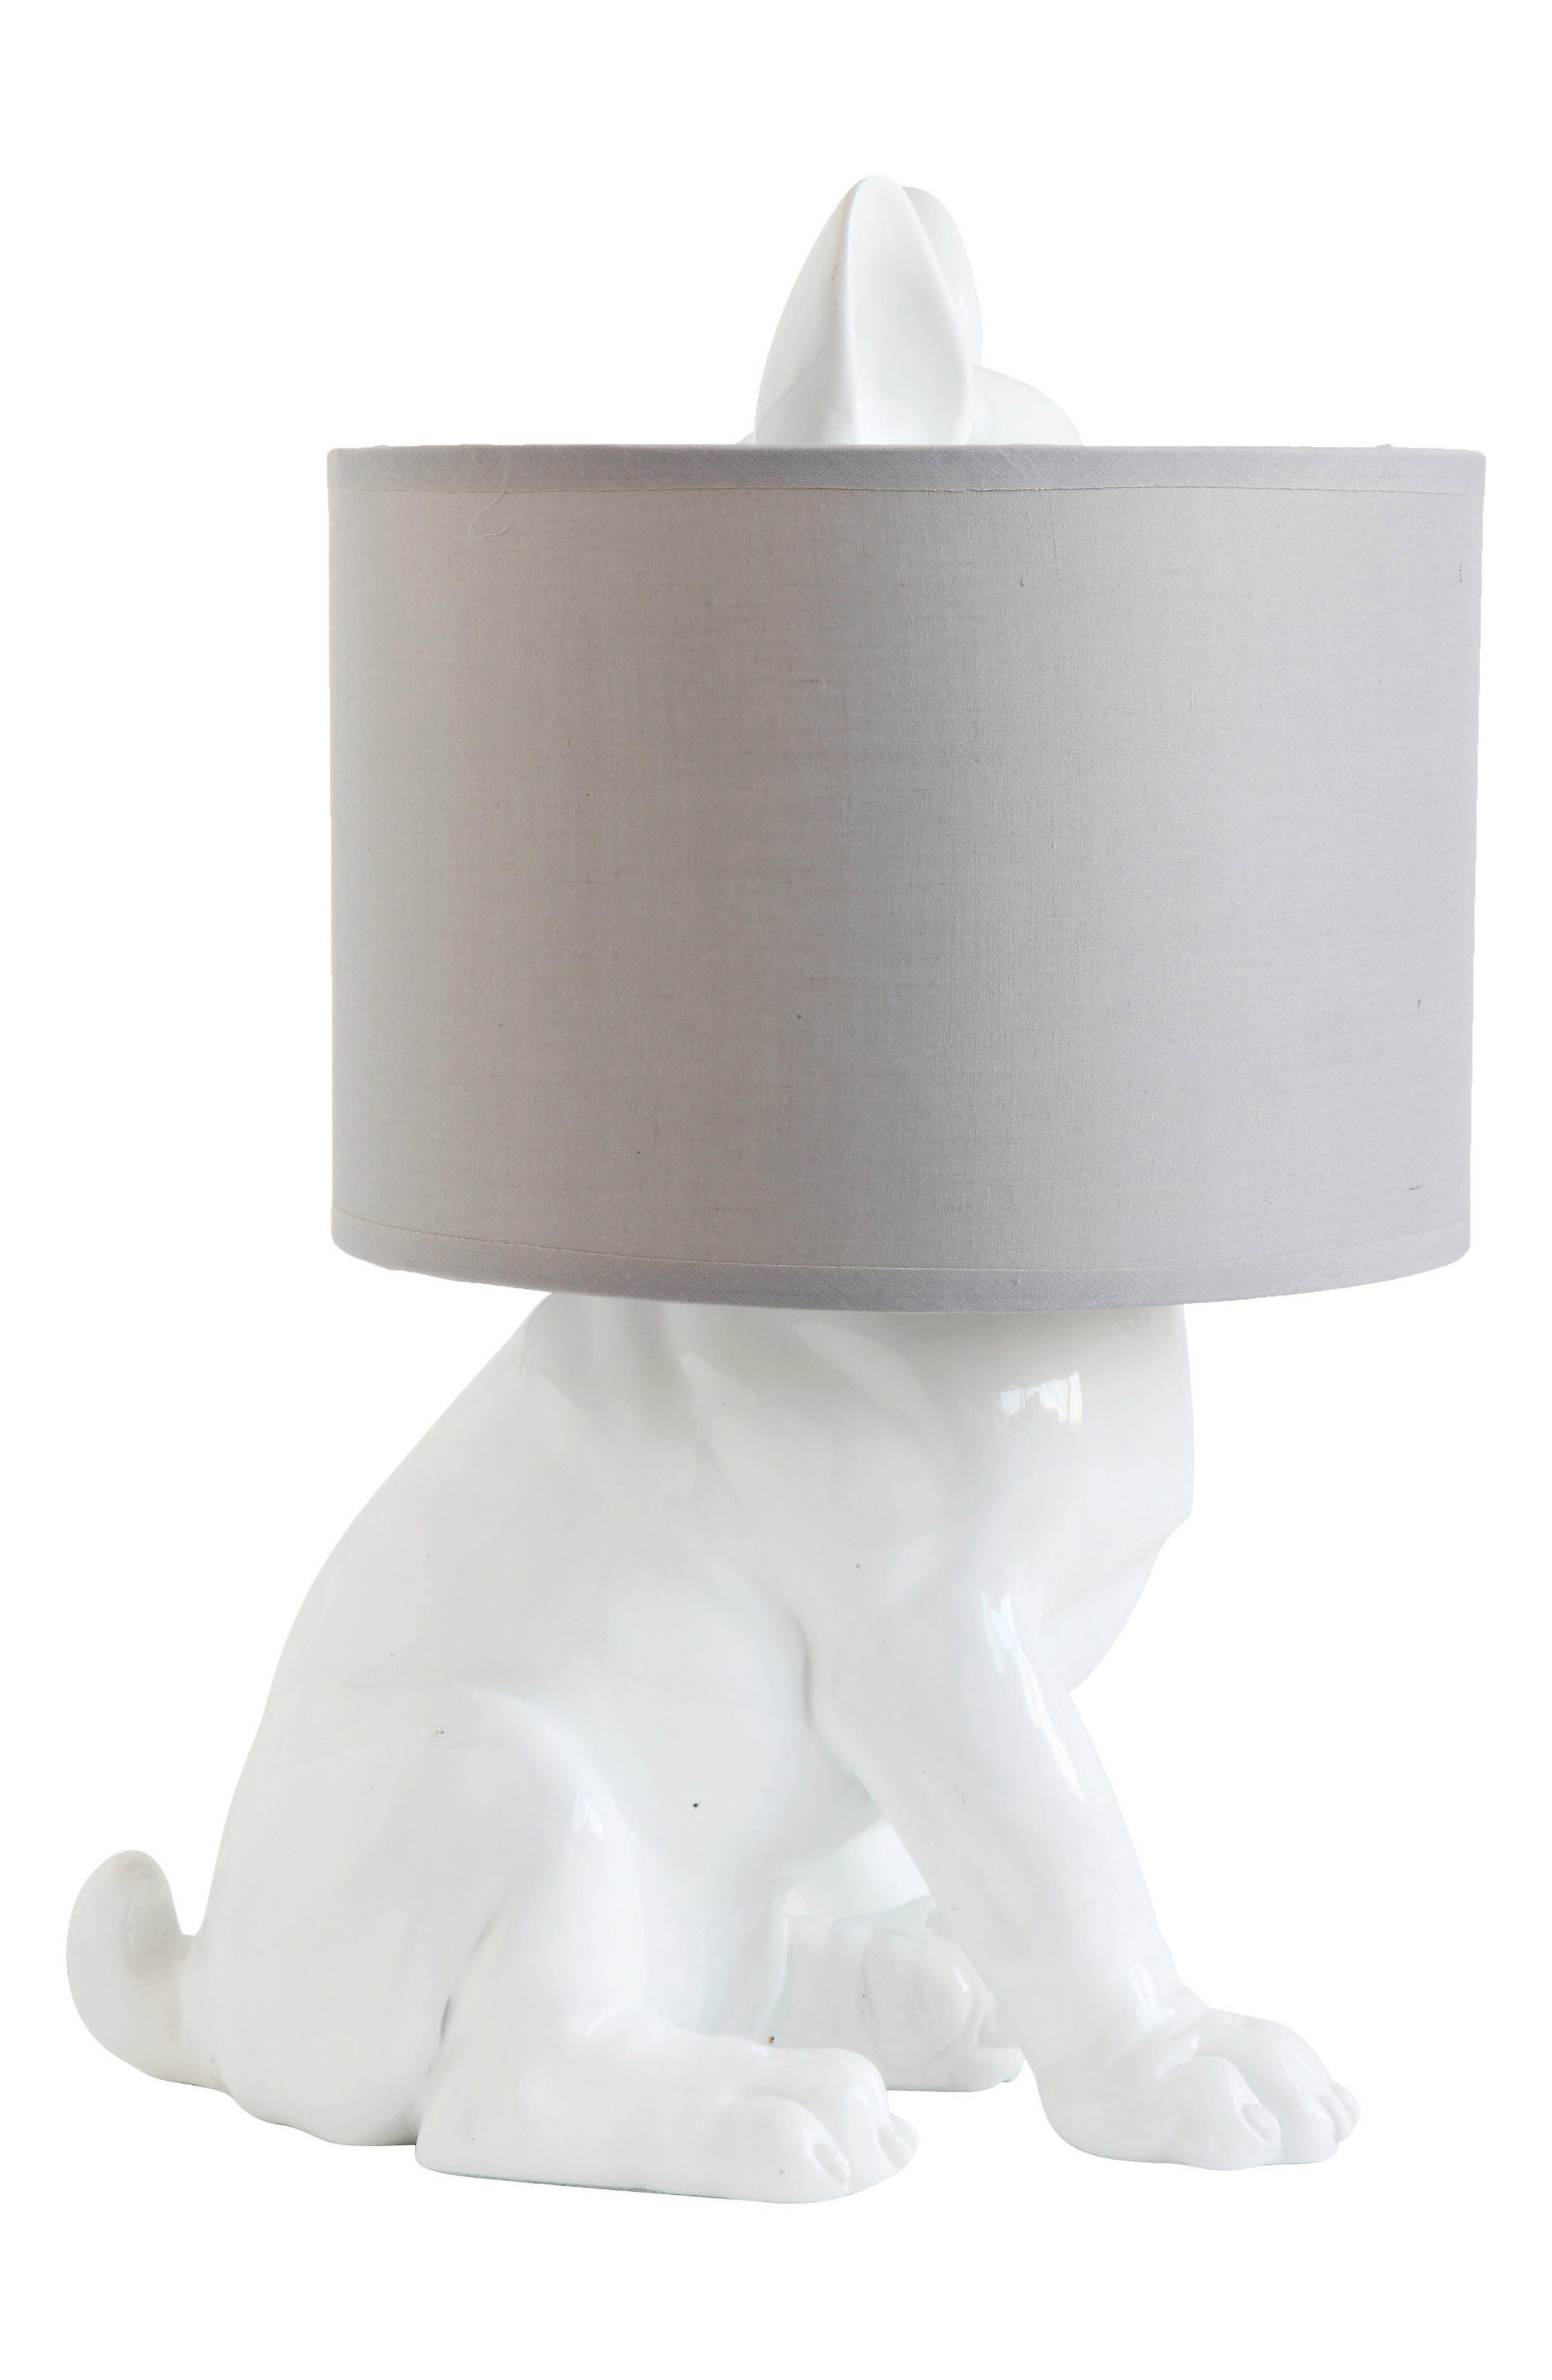 Alternate Image 1 Selected - Creative Co-Op Dog Lamp